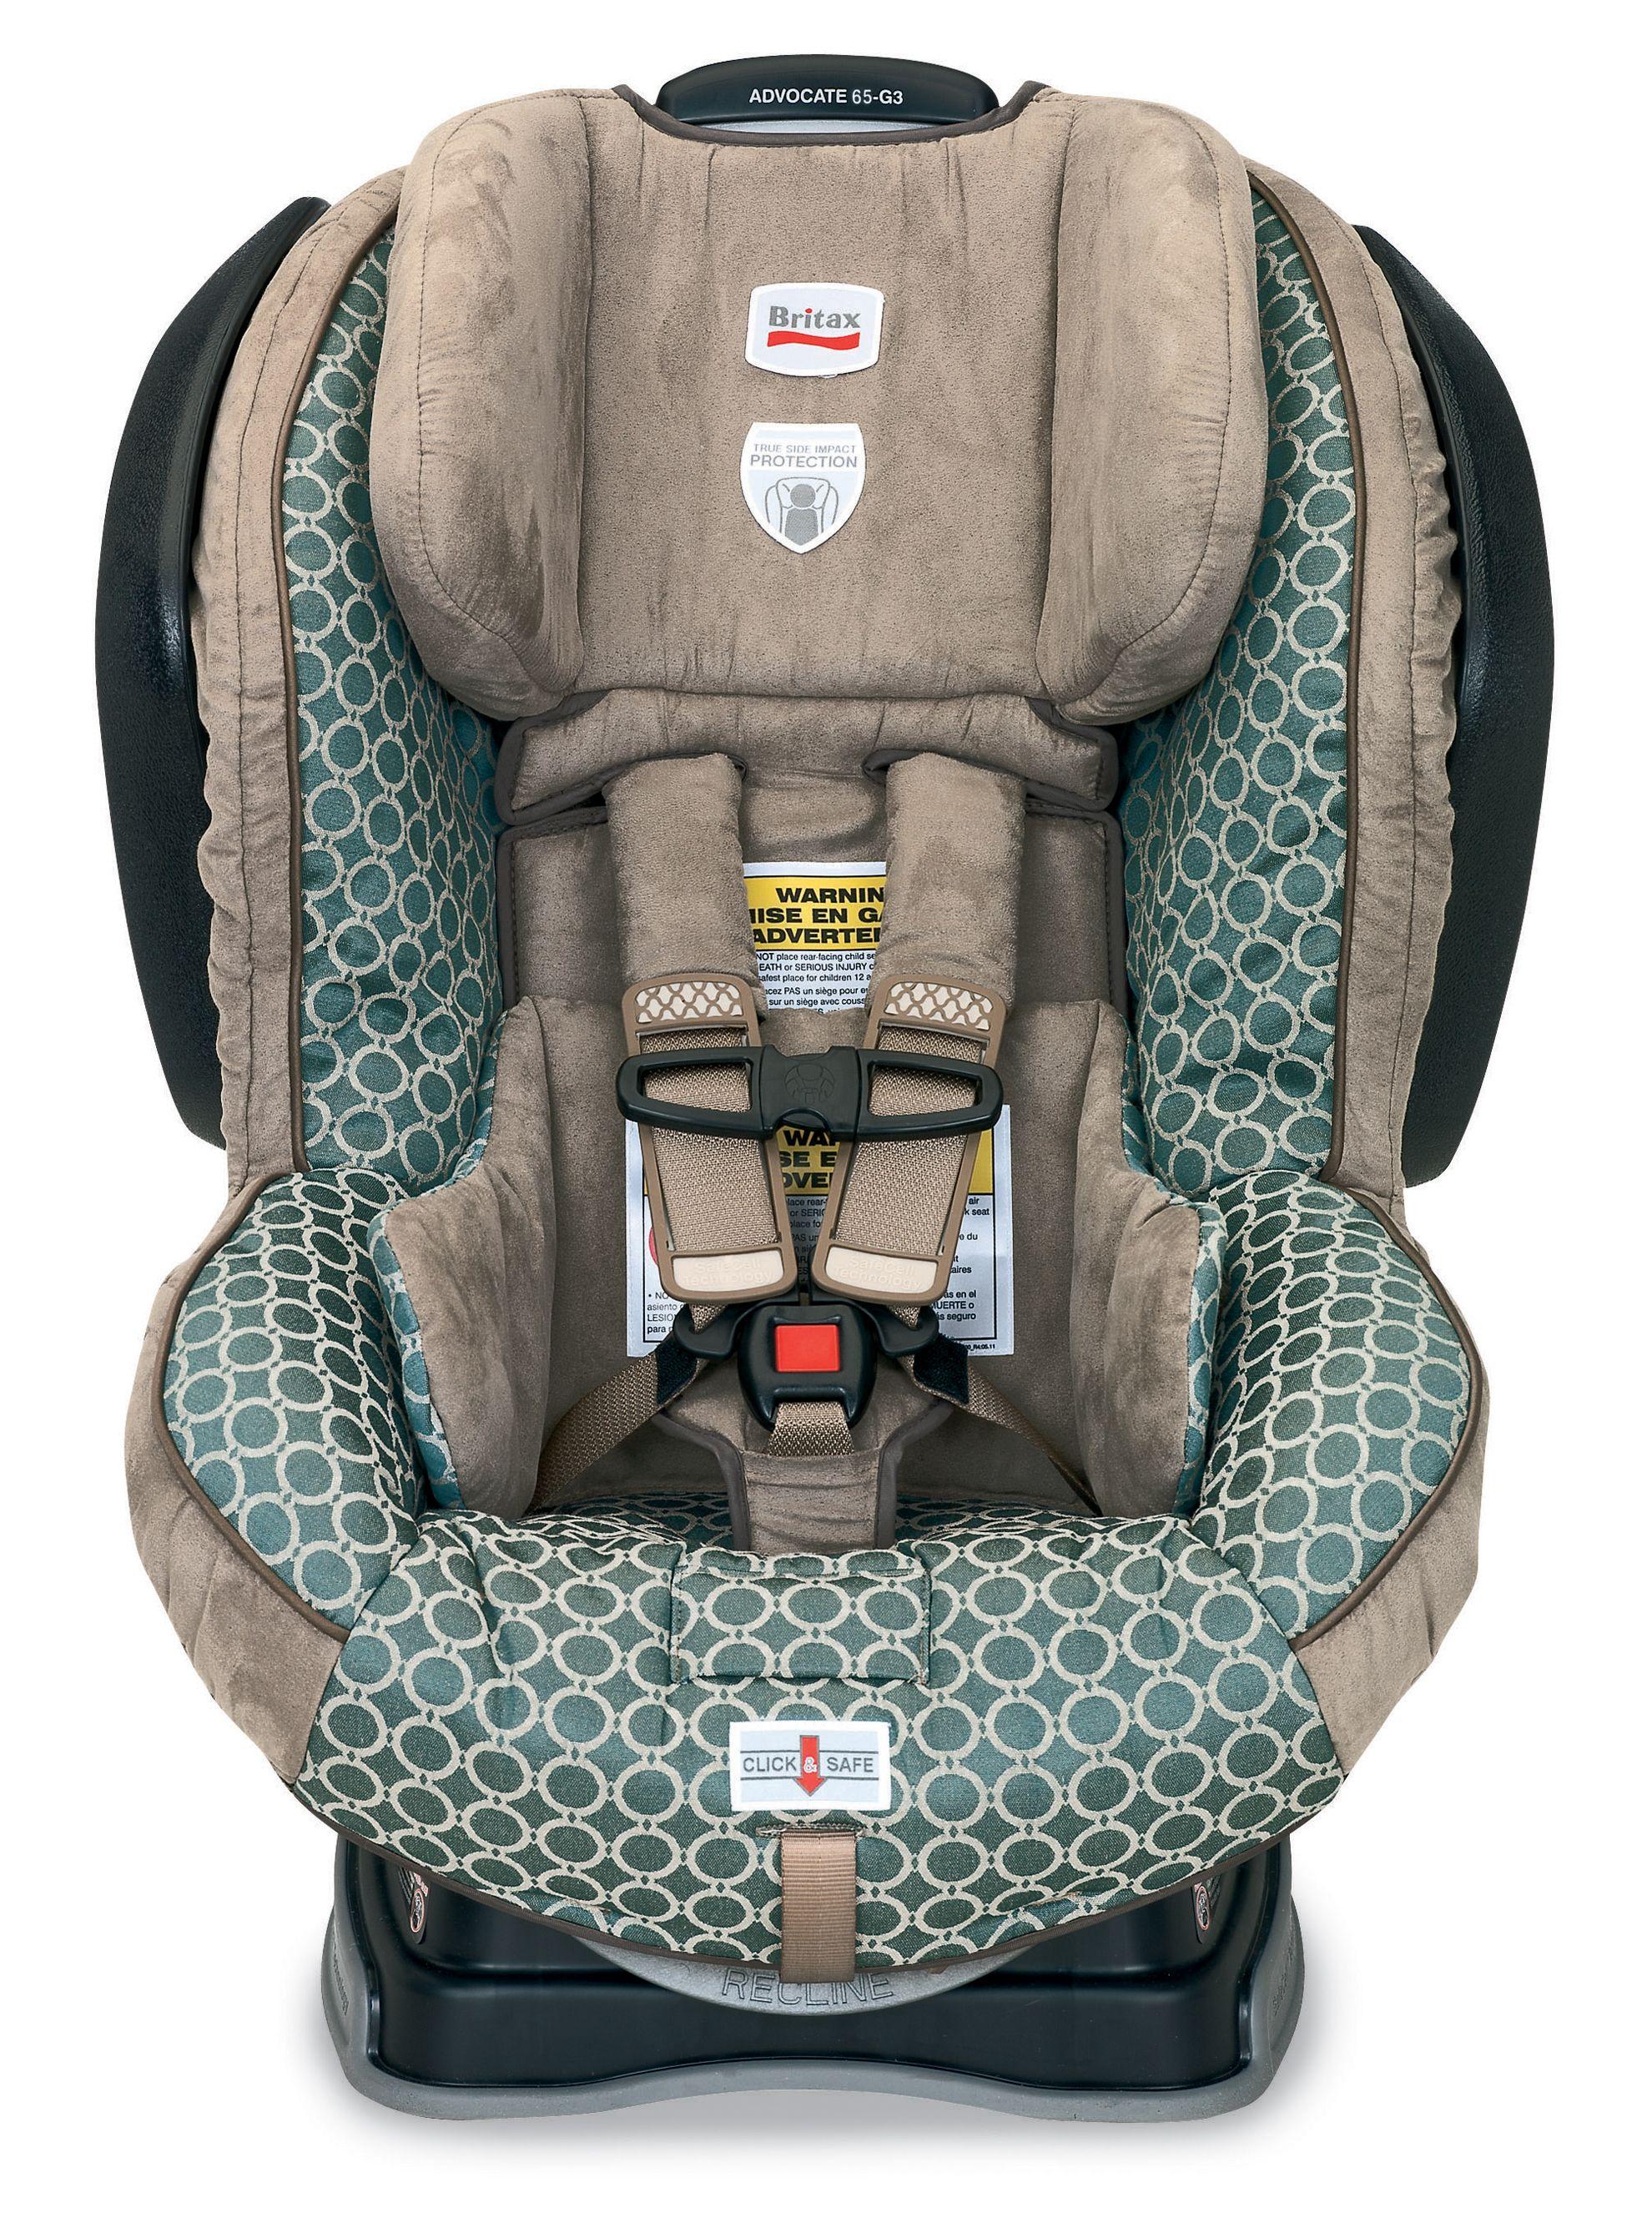 Britax Advocate 65 Serene Car seats, Convertible car